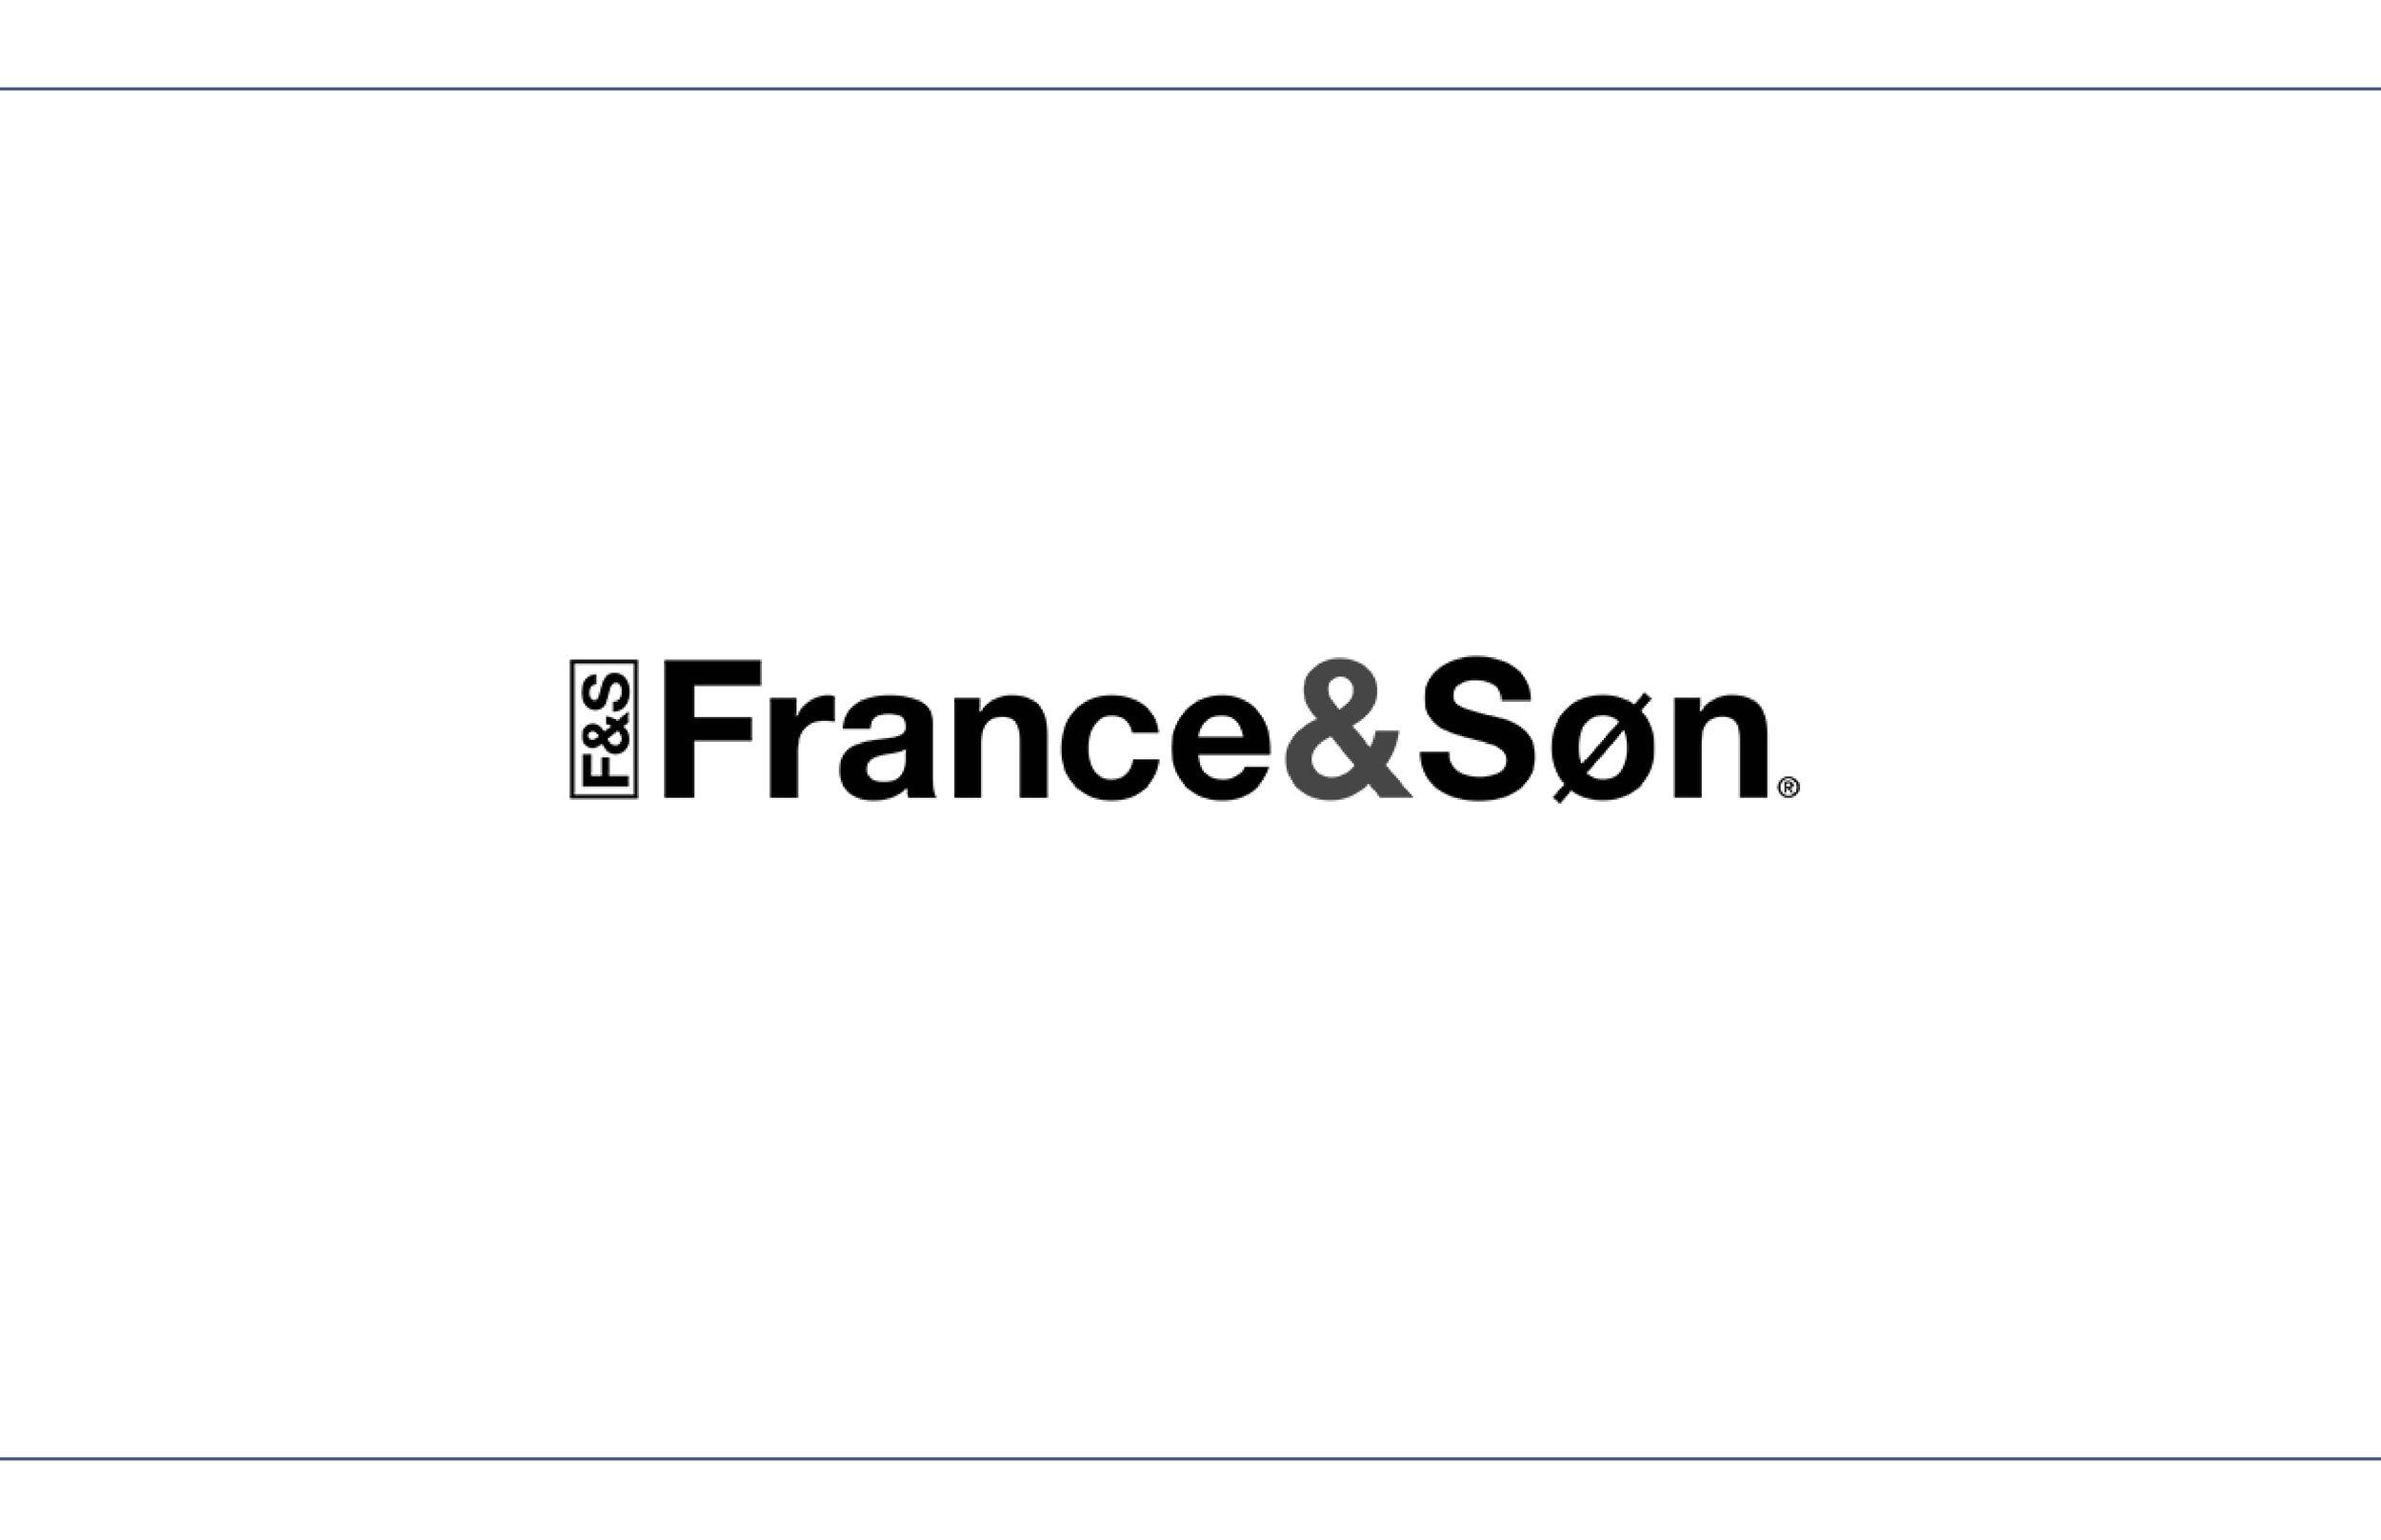 FRANCE & SON INTERVIEW WITH LIZ GOLDBERG